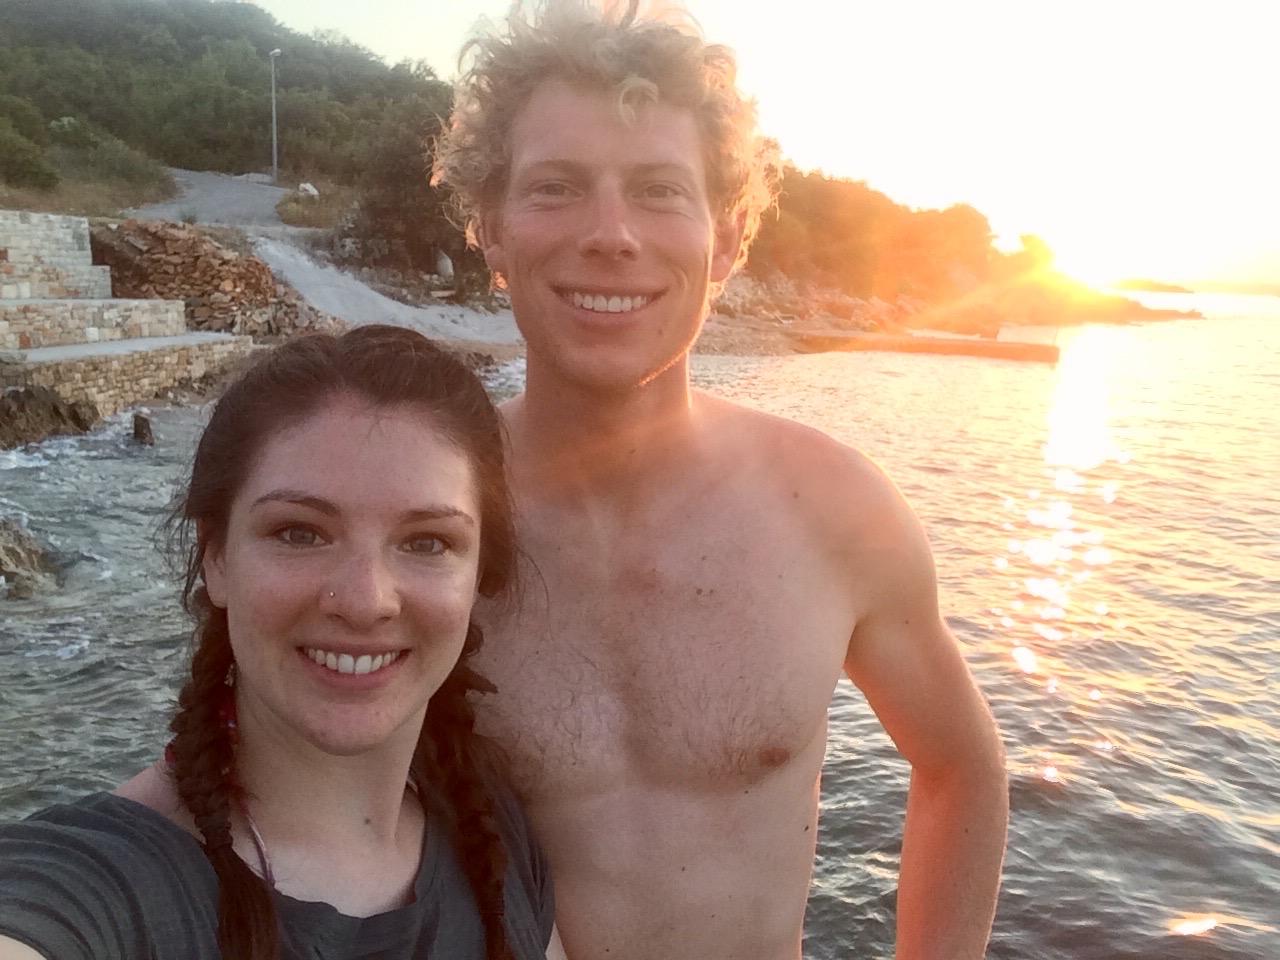 On the island of Korcula, Croatia, with Vic.